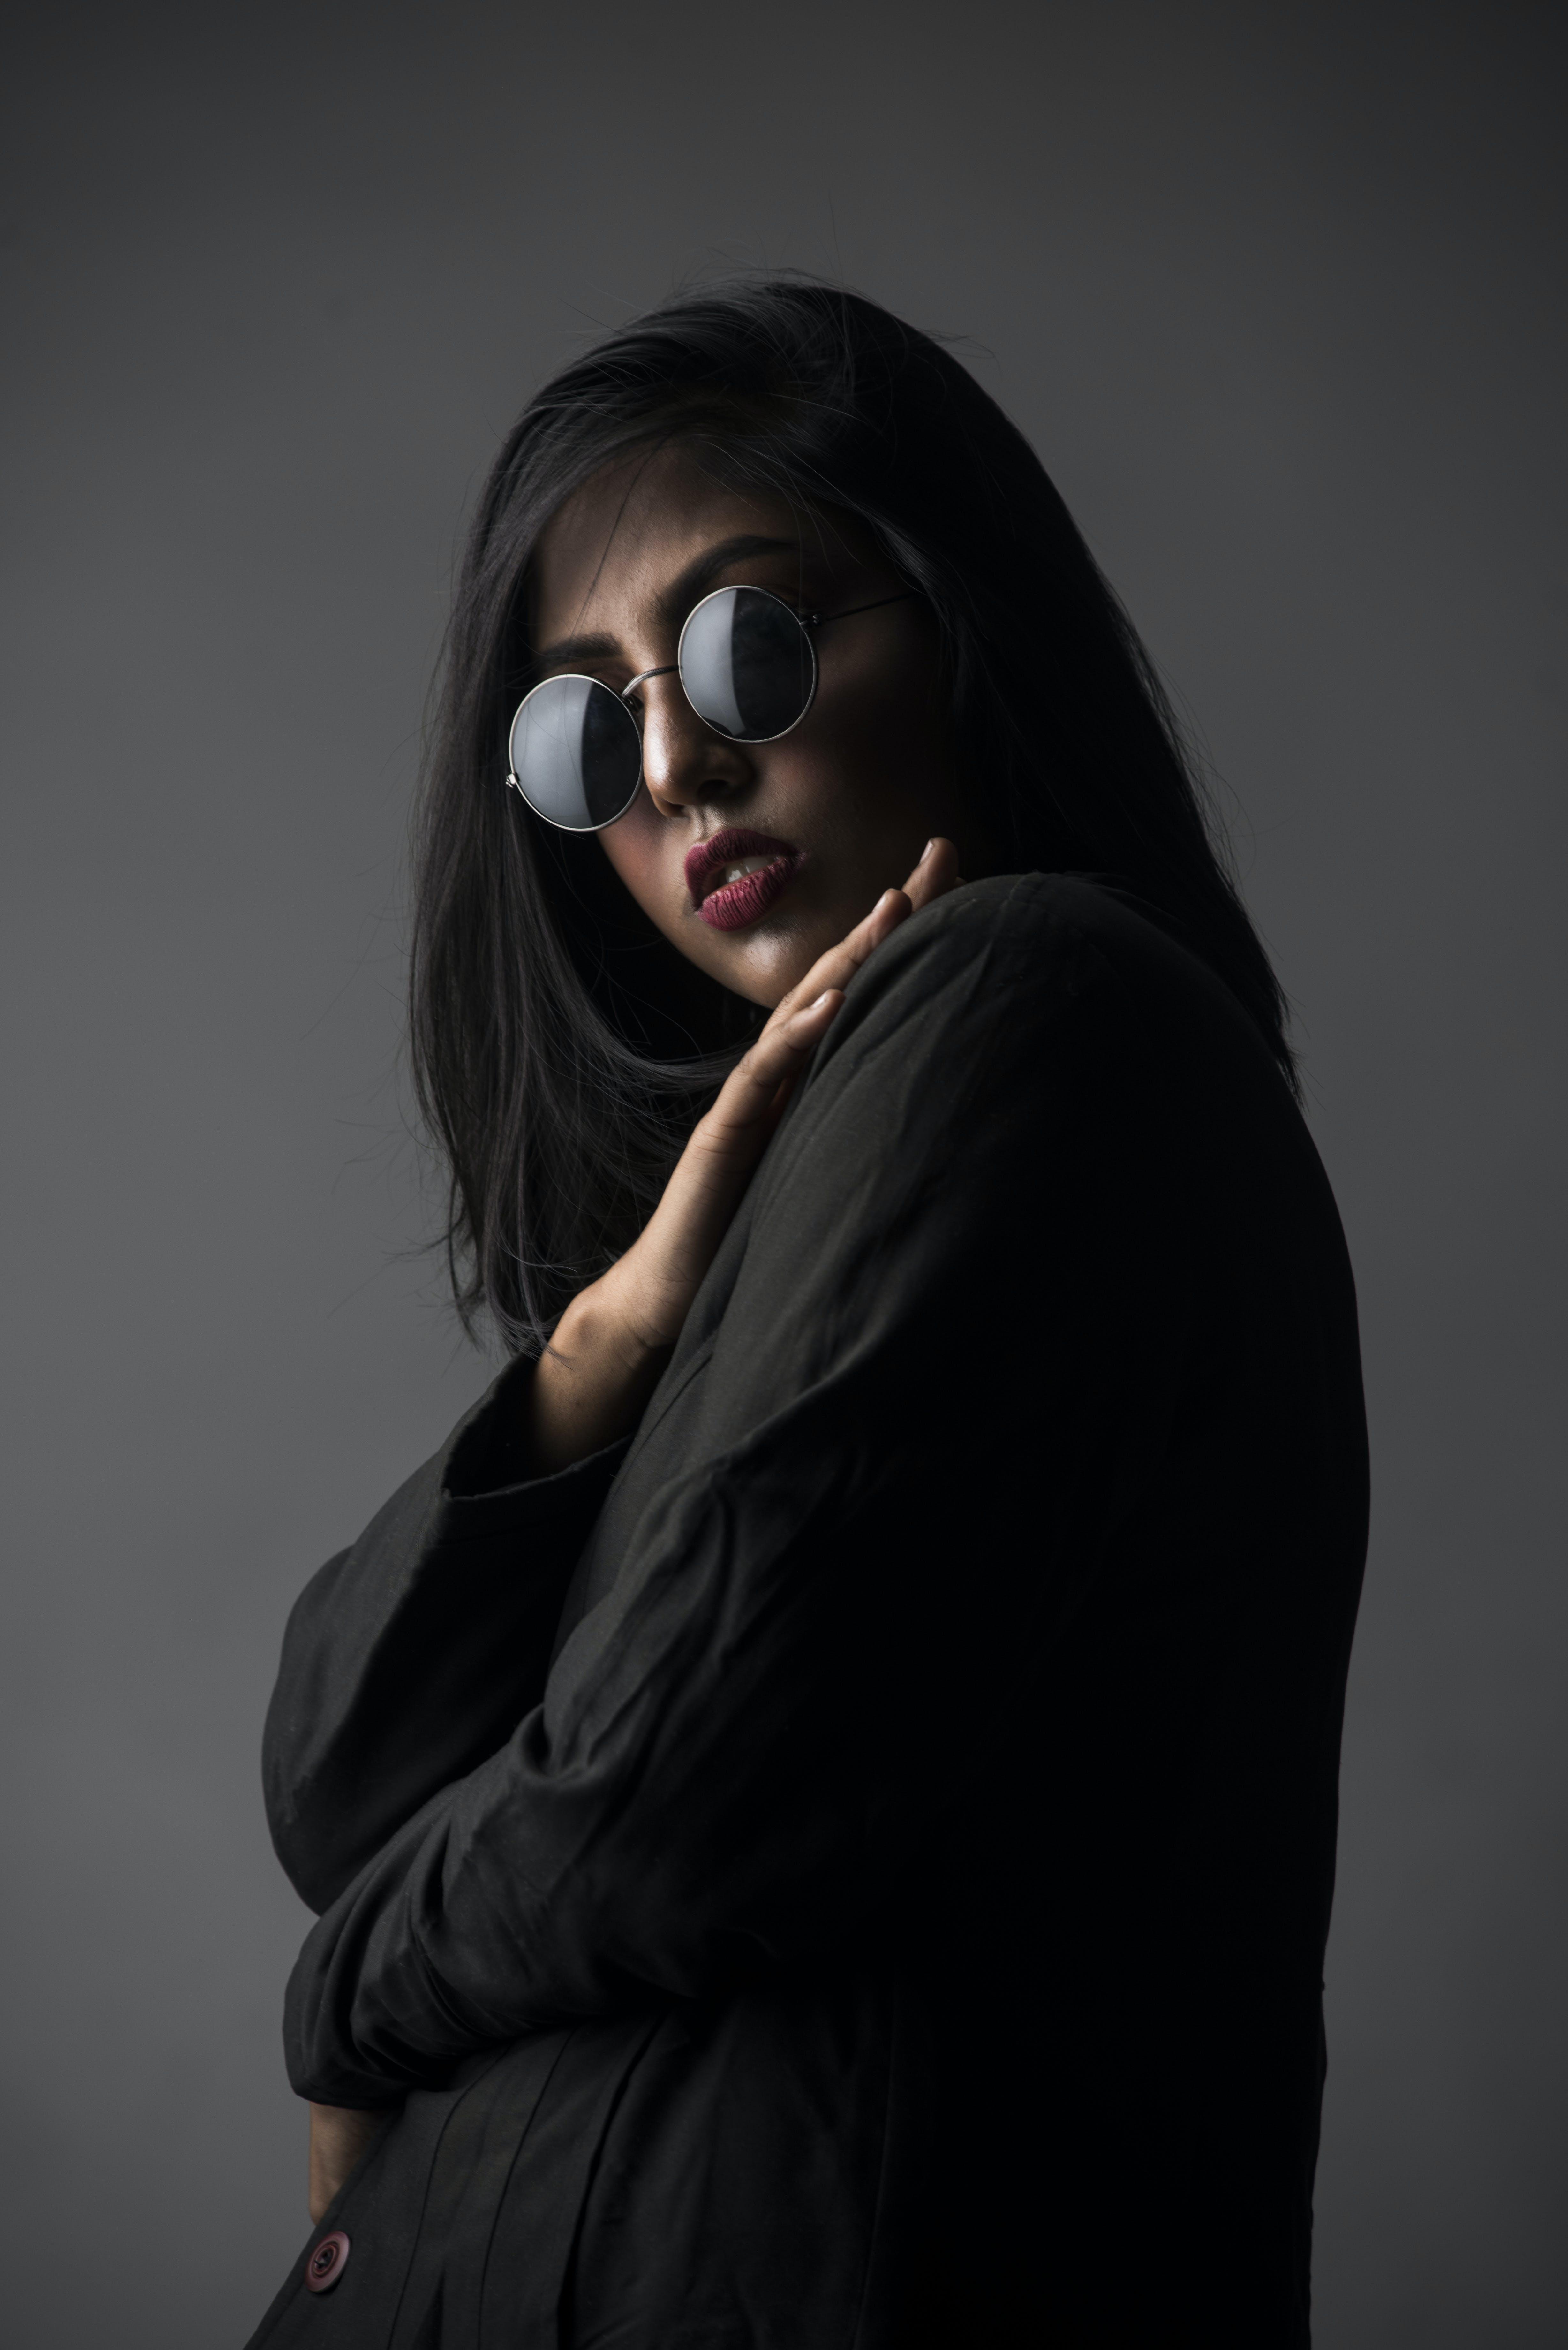 Gratis stockfoto met aantrekkelijk mooi, elegant, fashion, fashion model